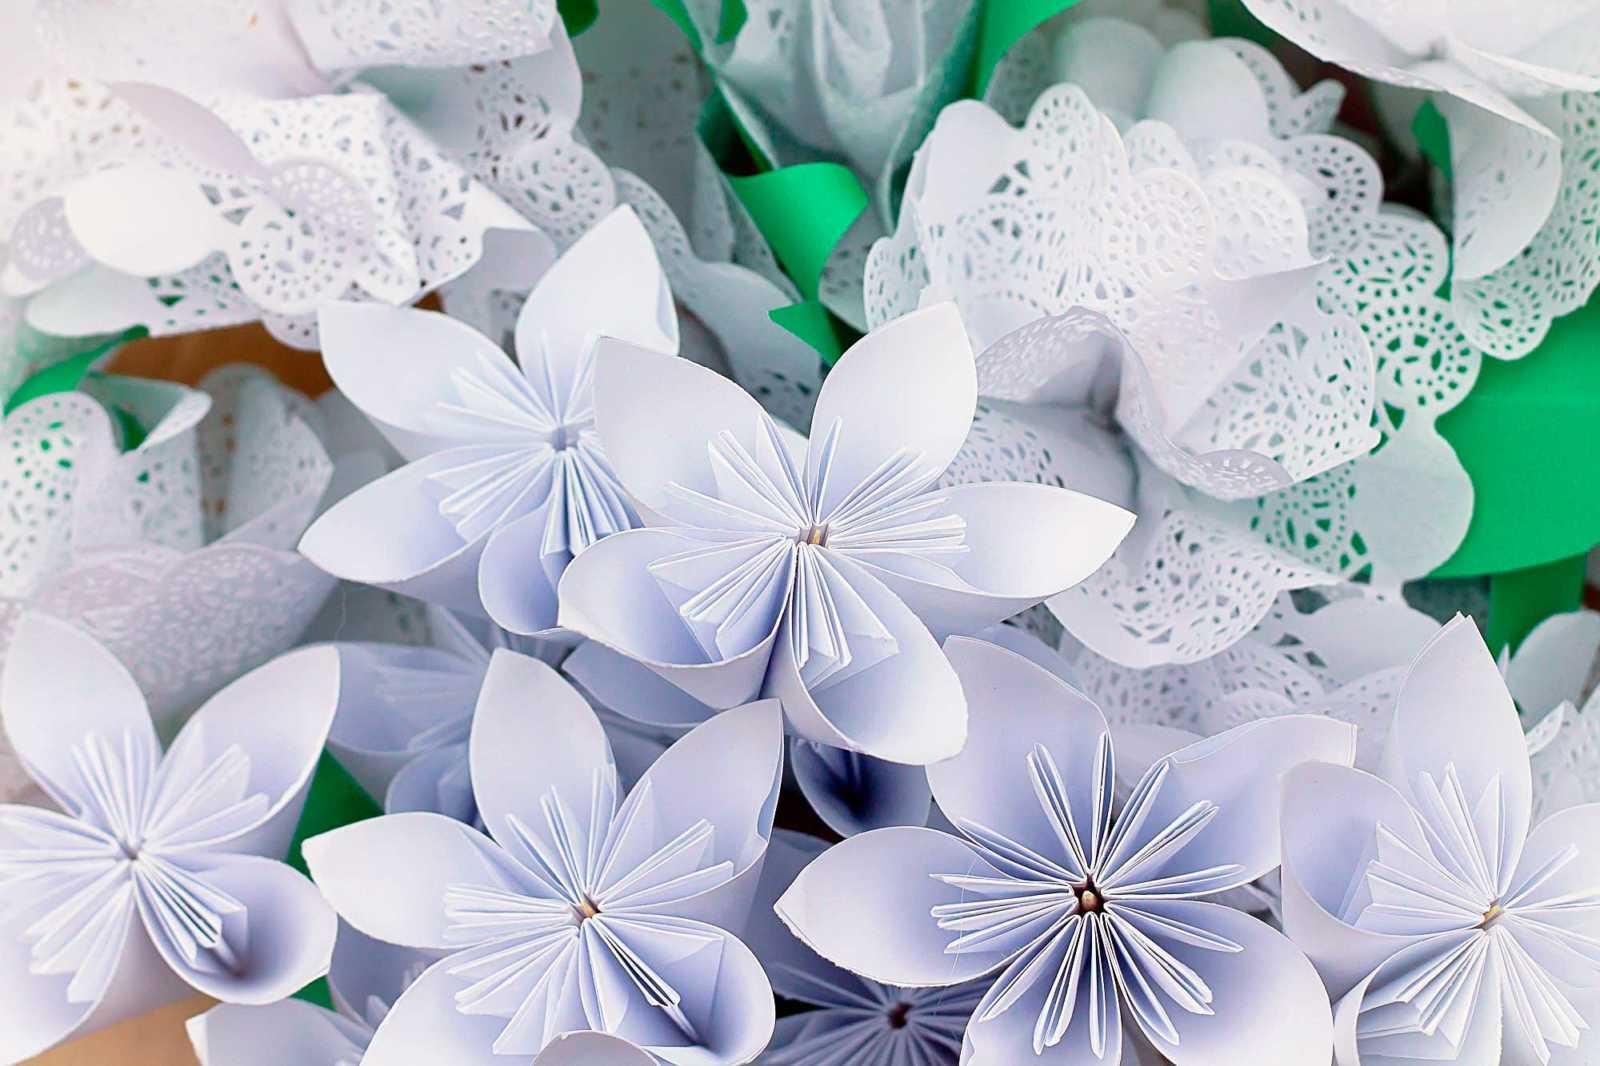 Акция Белый цветок. Город Челябинск 2018